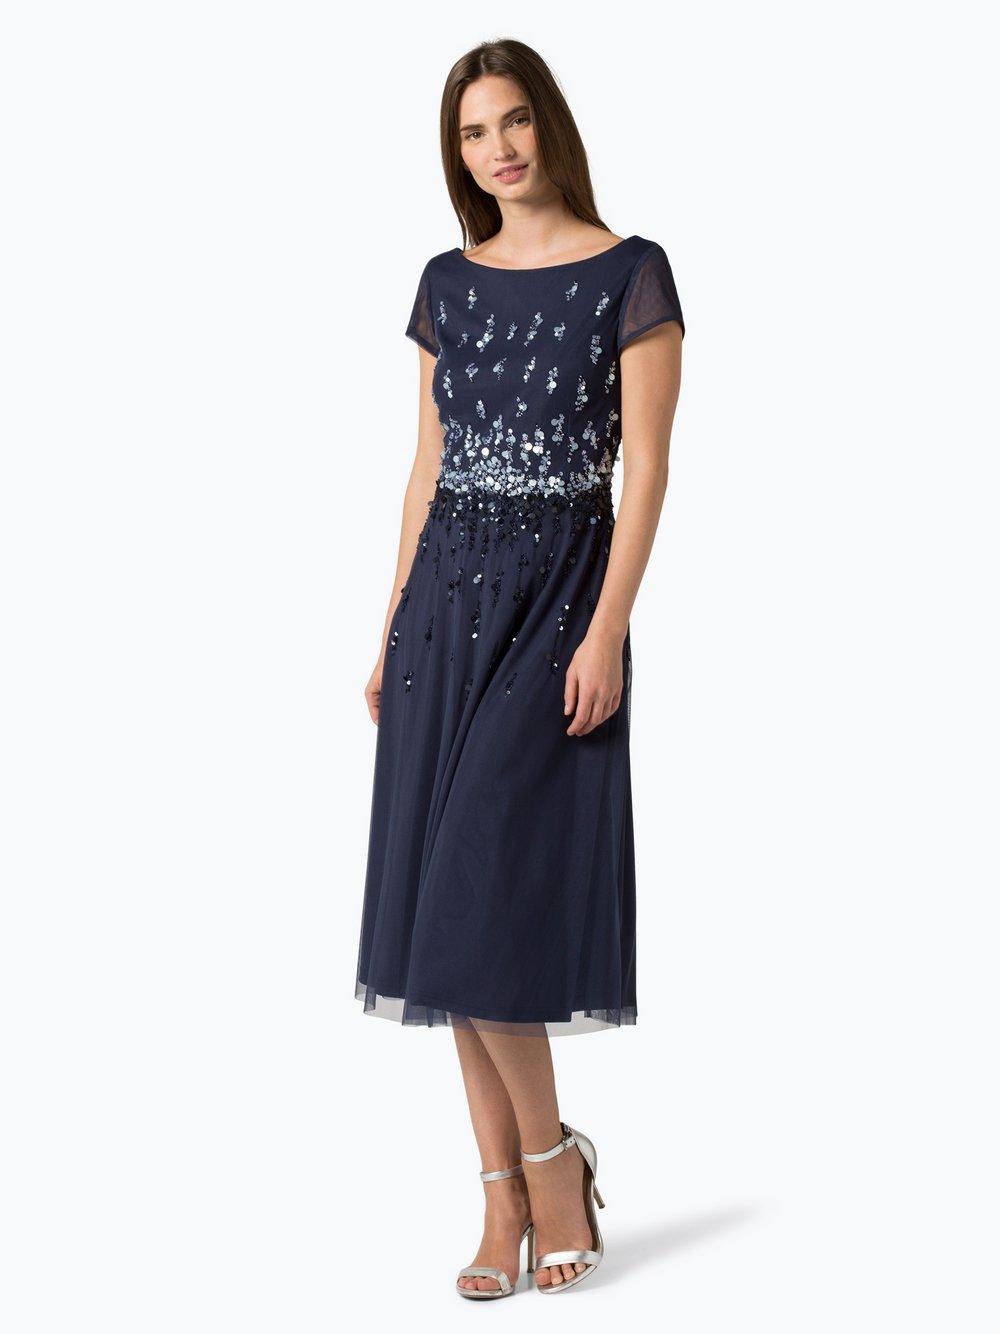 Vera Mont Collection - Damska sukienka wieczorowa, niebieski